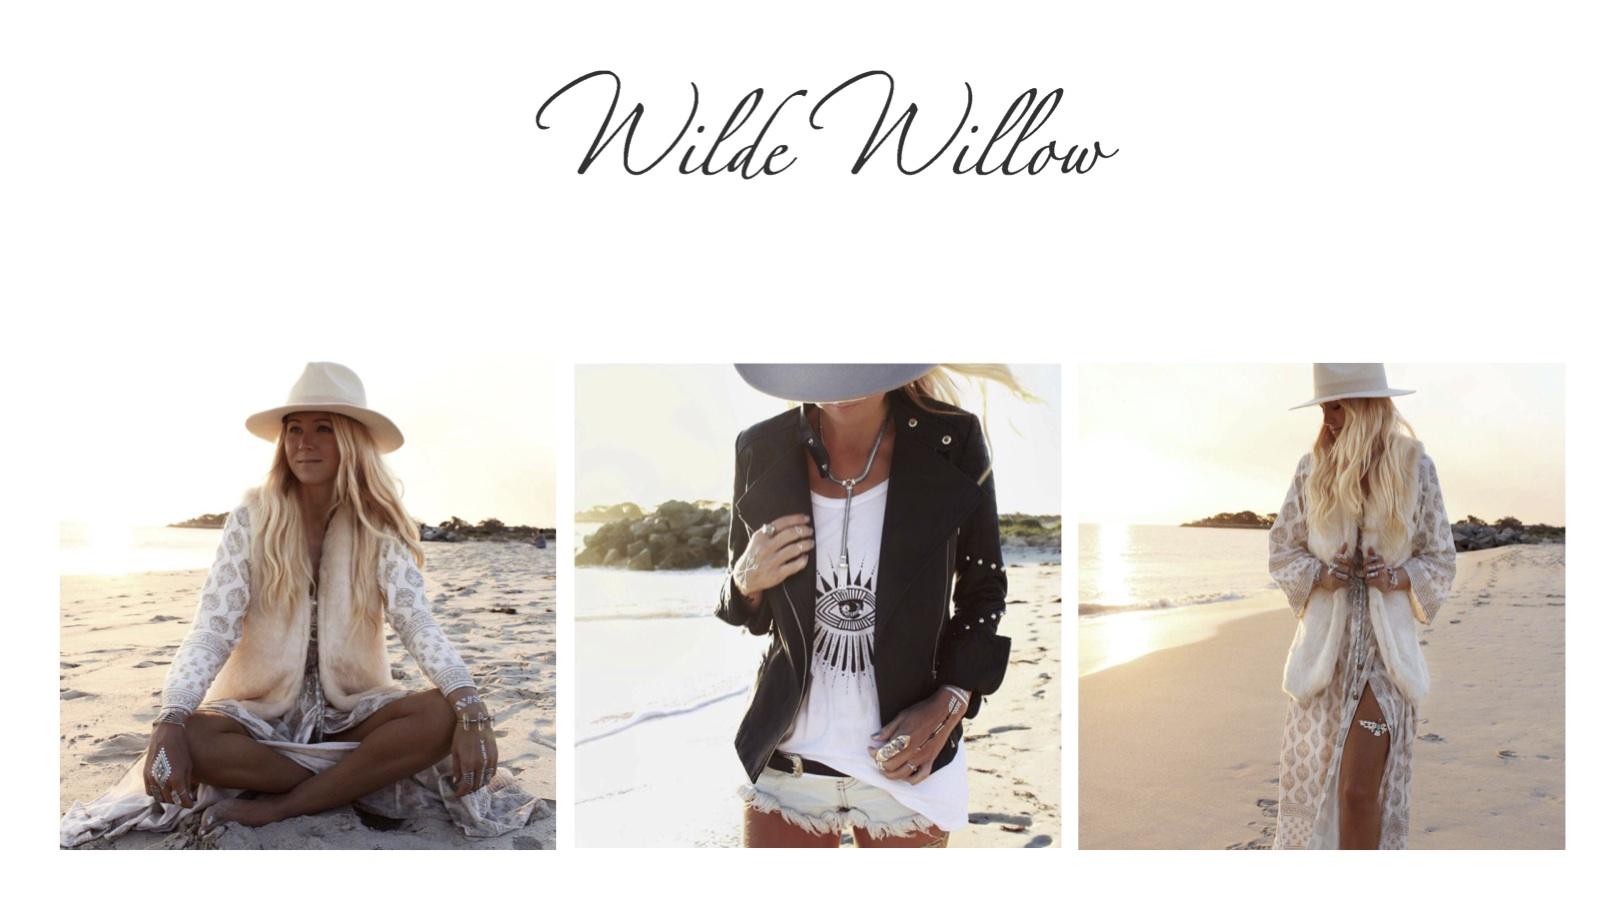 Wilde Willow